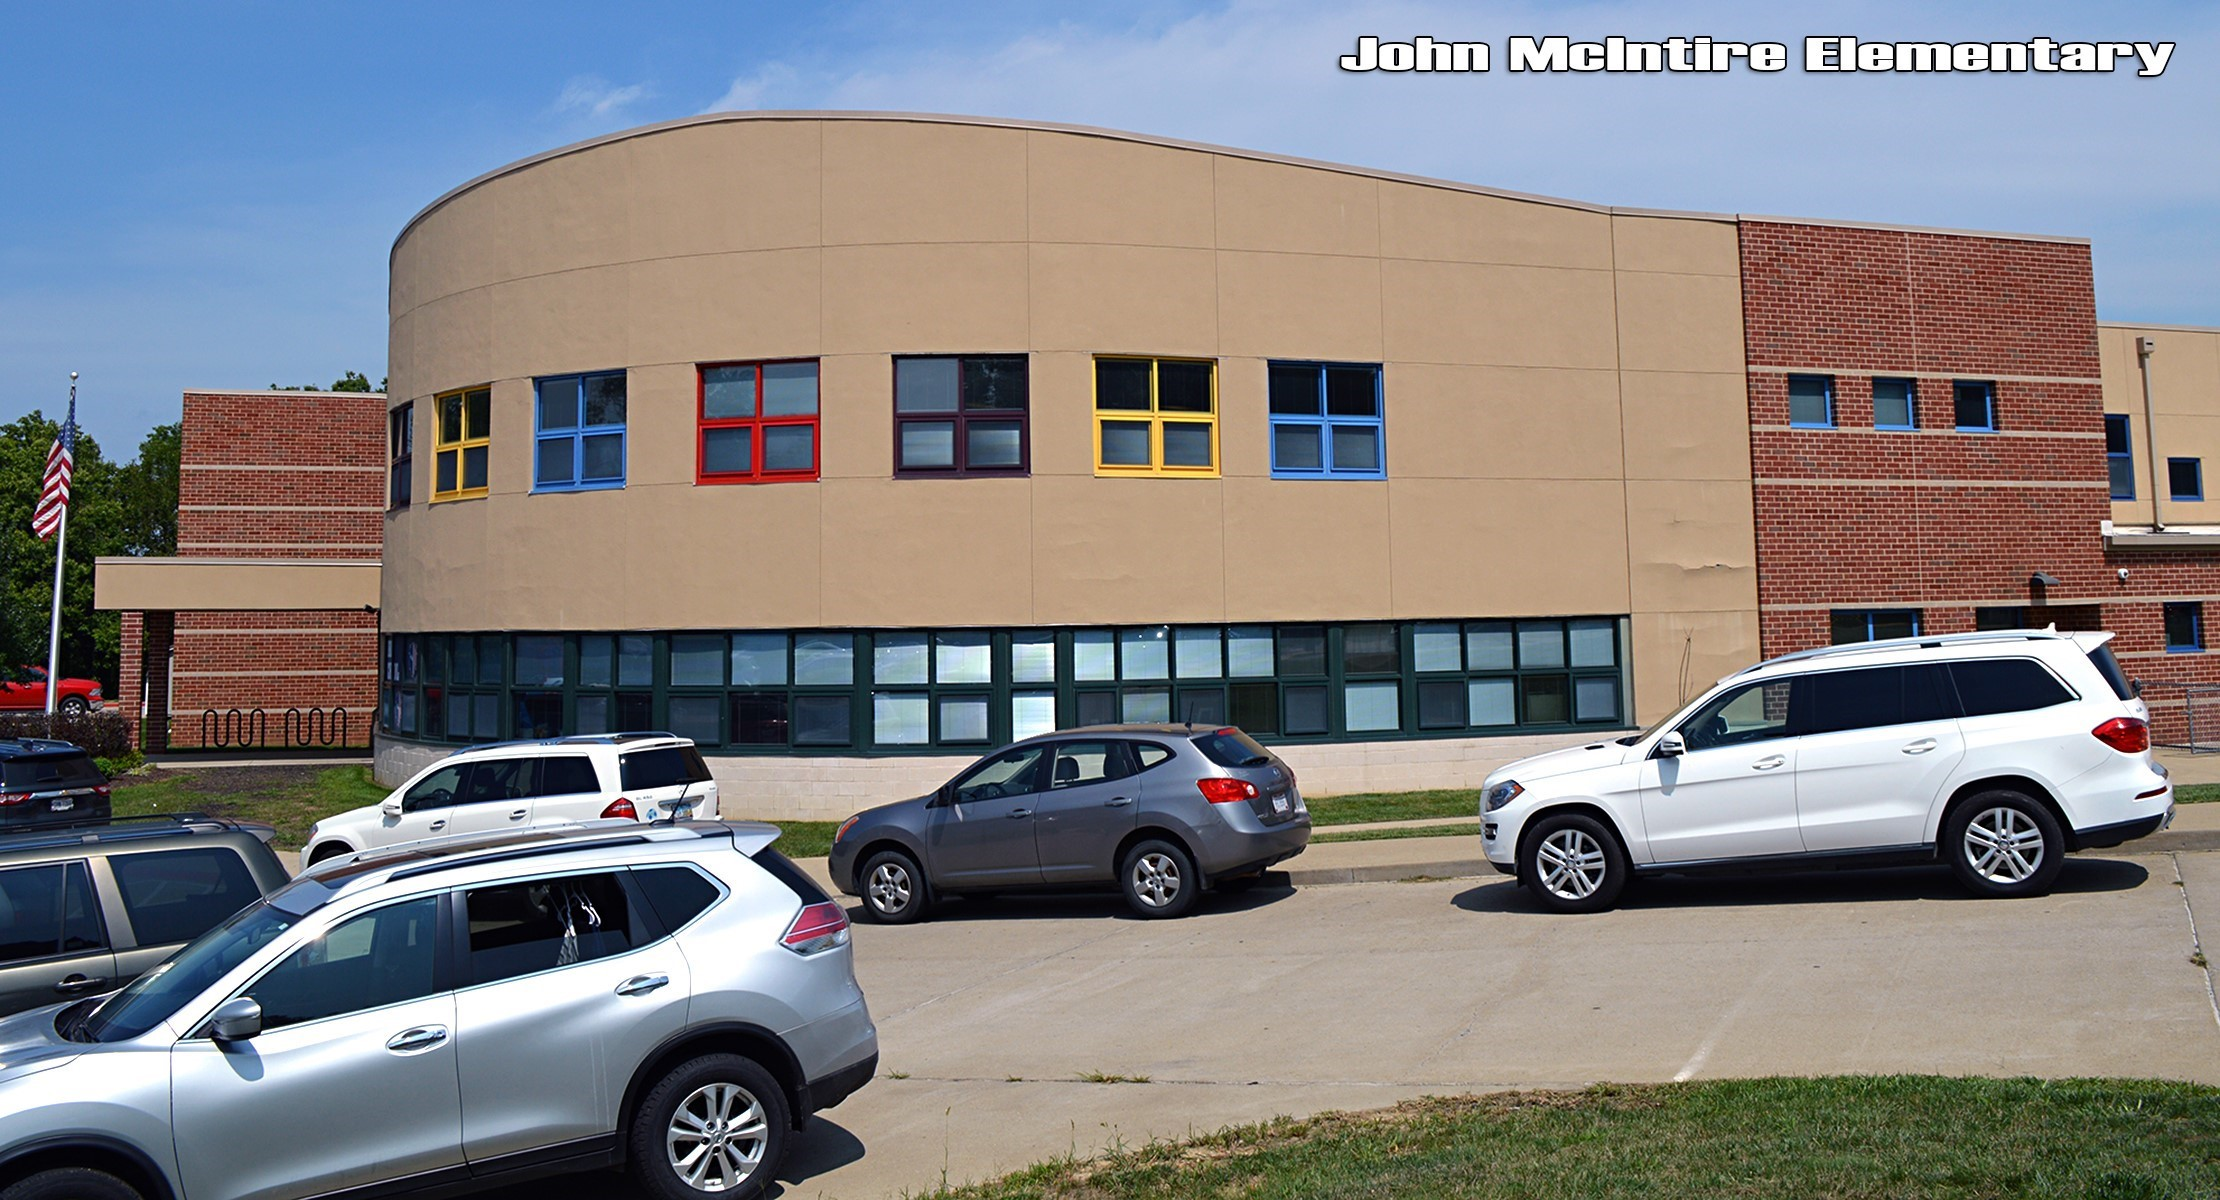 John McIntire Elementary building